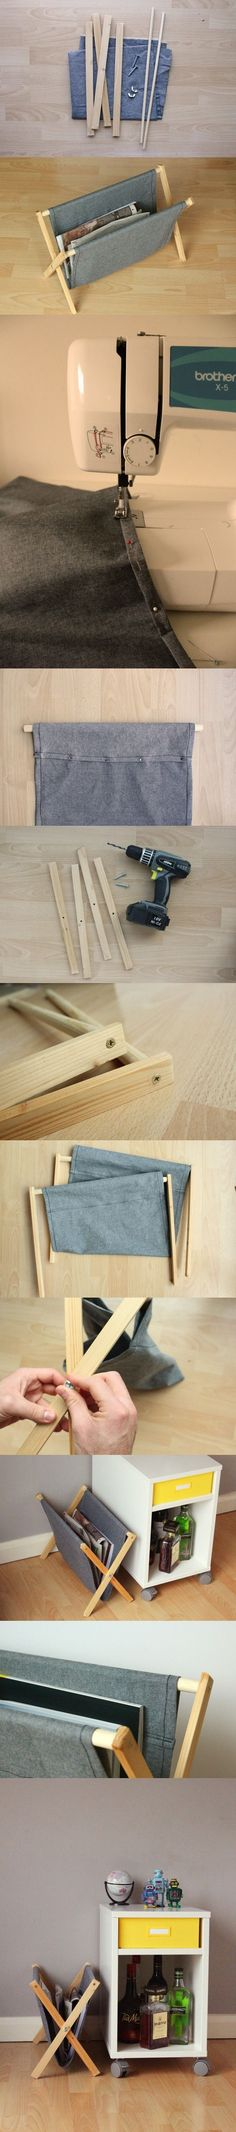 Un revistero plegable DIY - Va http://www.manmadediy.com/